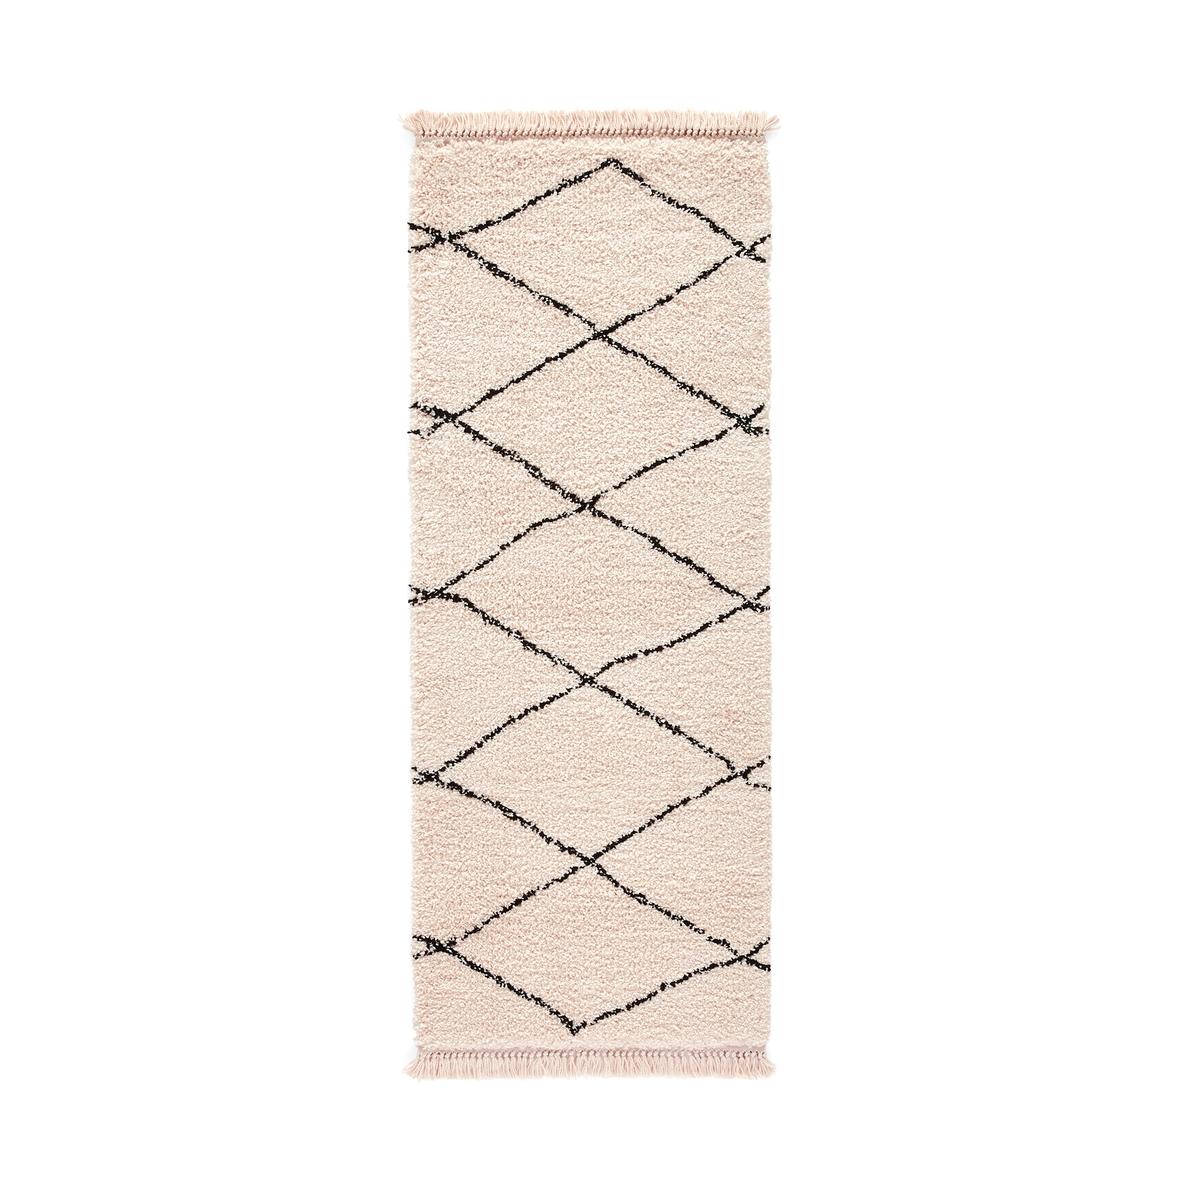 Ковер La Redoute Для коридора в берберском стиле Fatouh 80 x 300 см бежевый